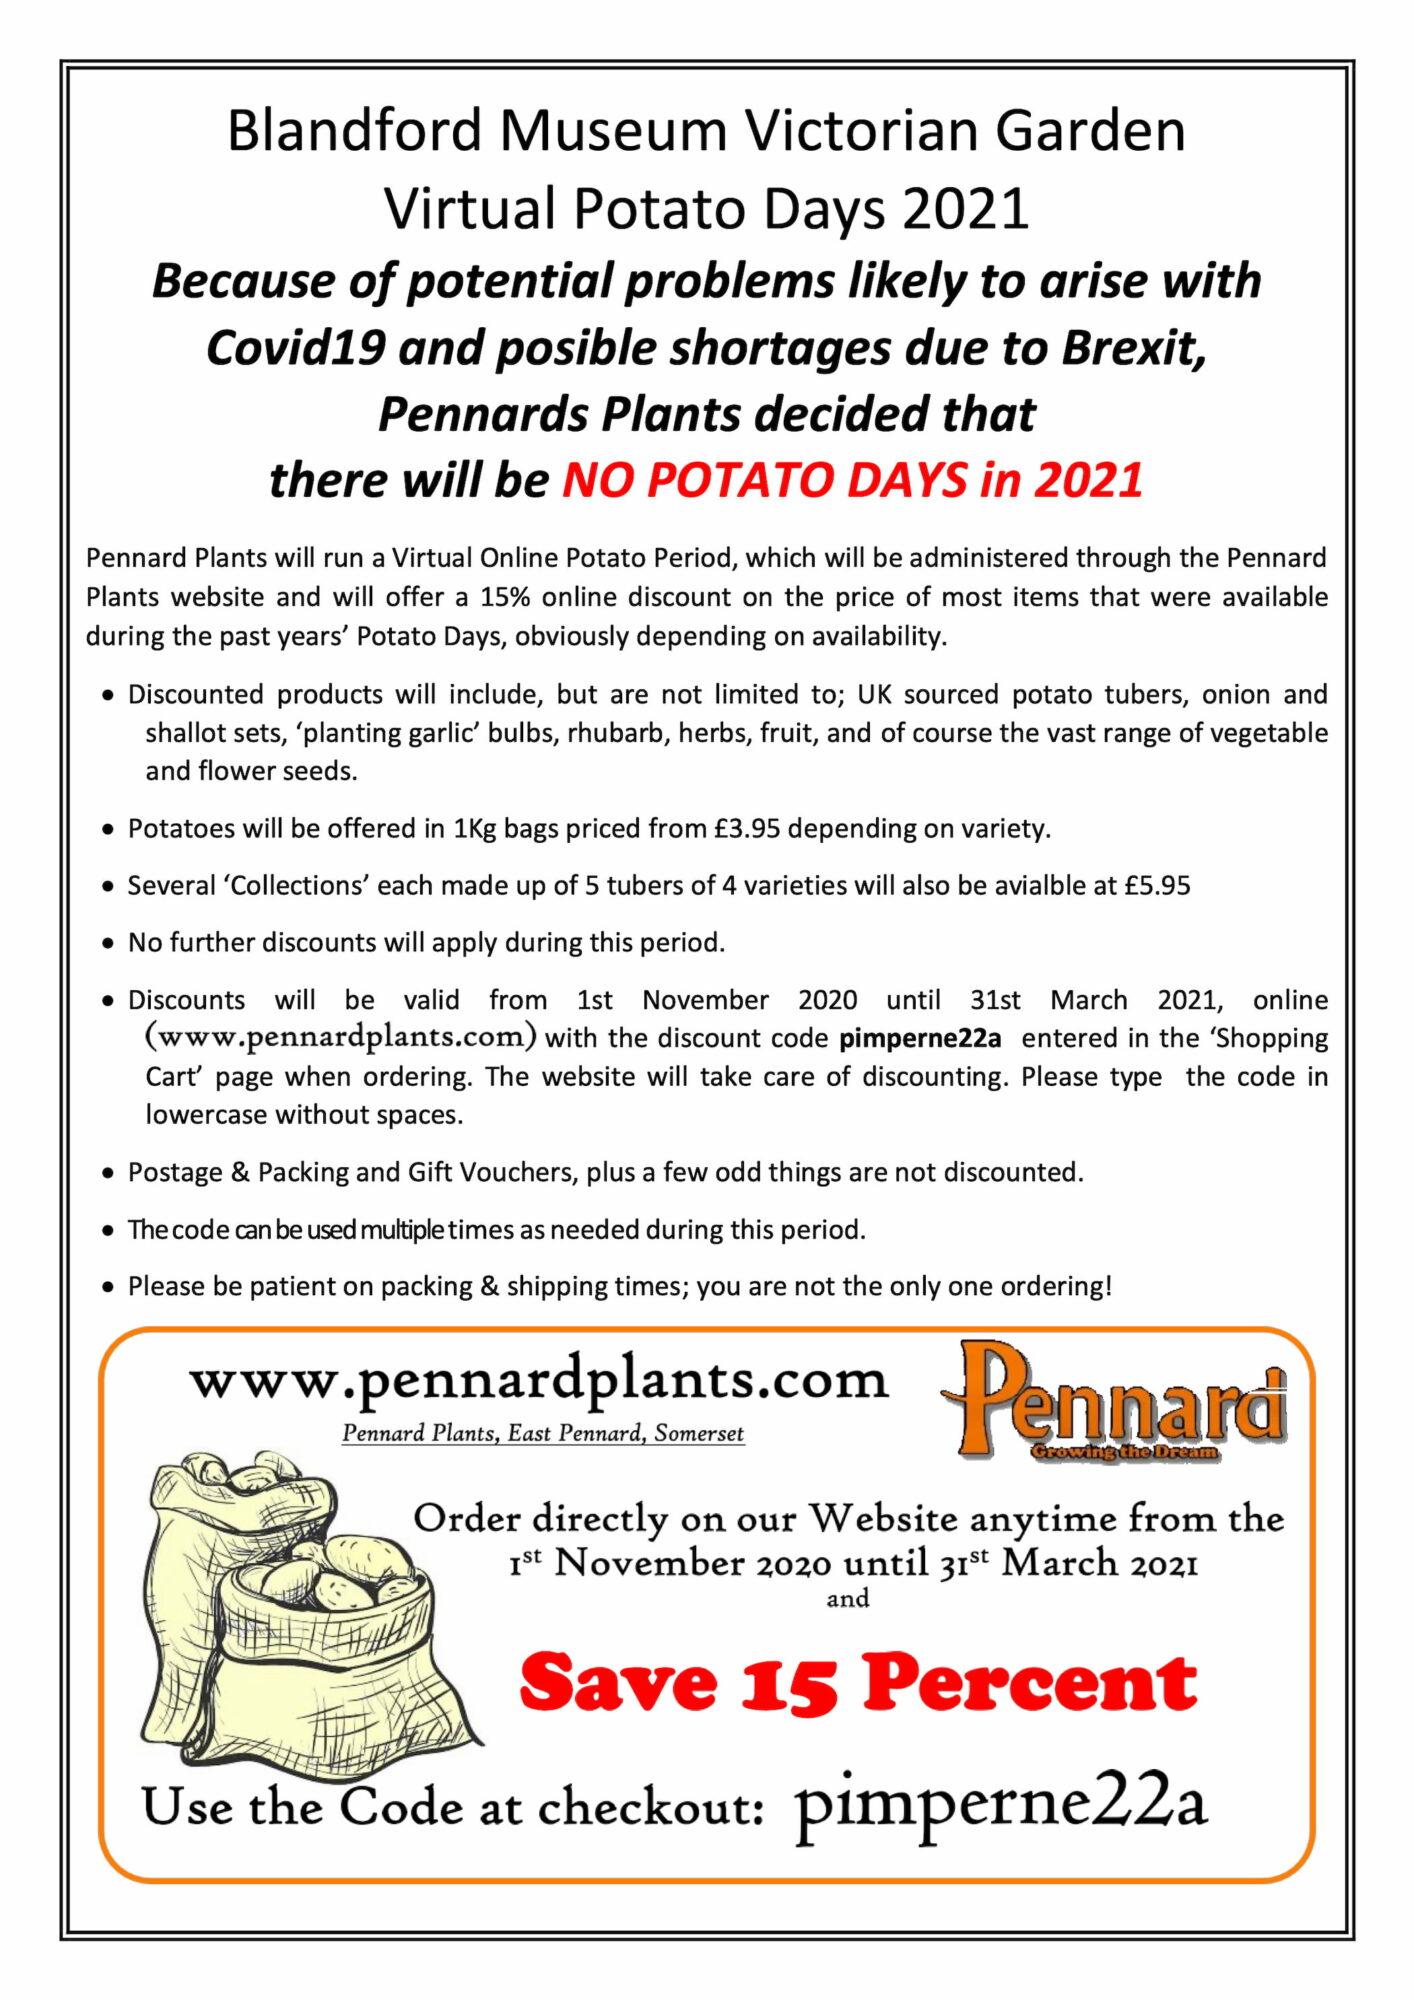 2021 Potato Day Blandford Discounts